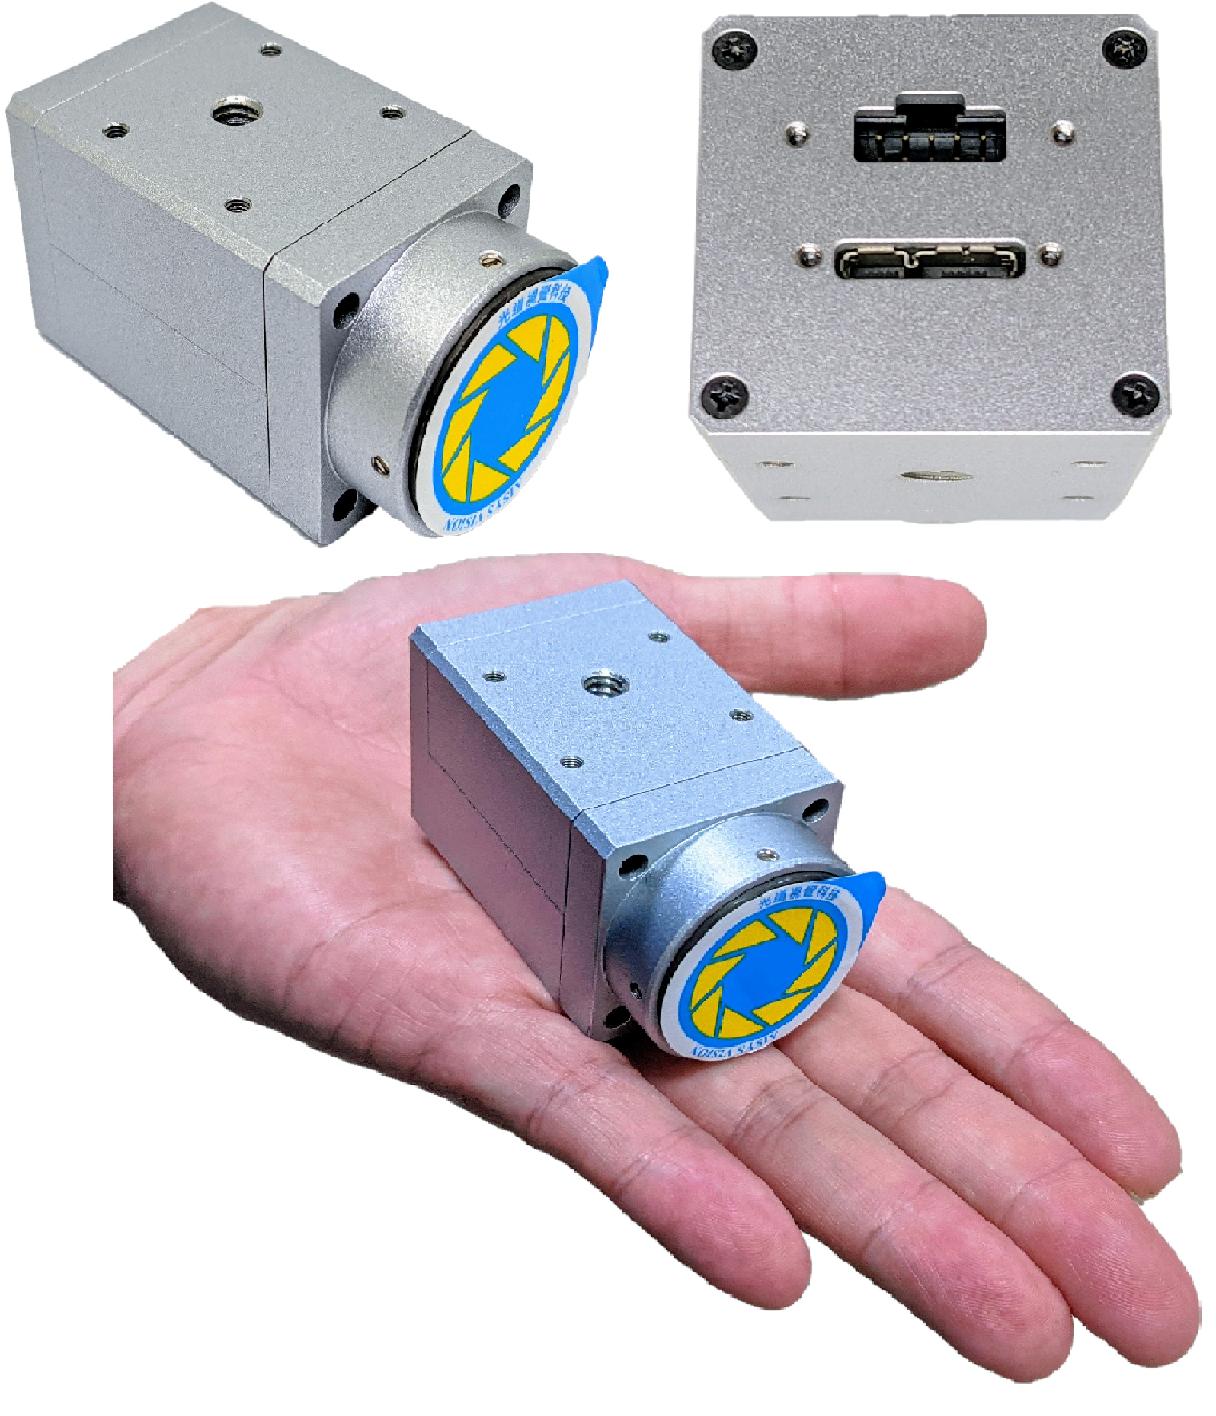 CYCLOPS SU1000-8攝影機-10.0M像素、內同步式、灰階、內建LED燈源控制器